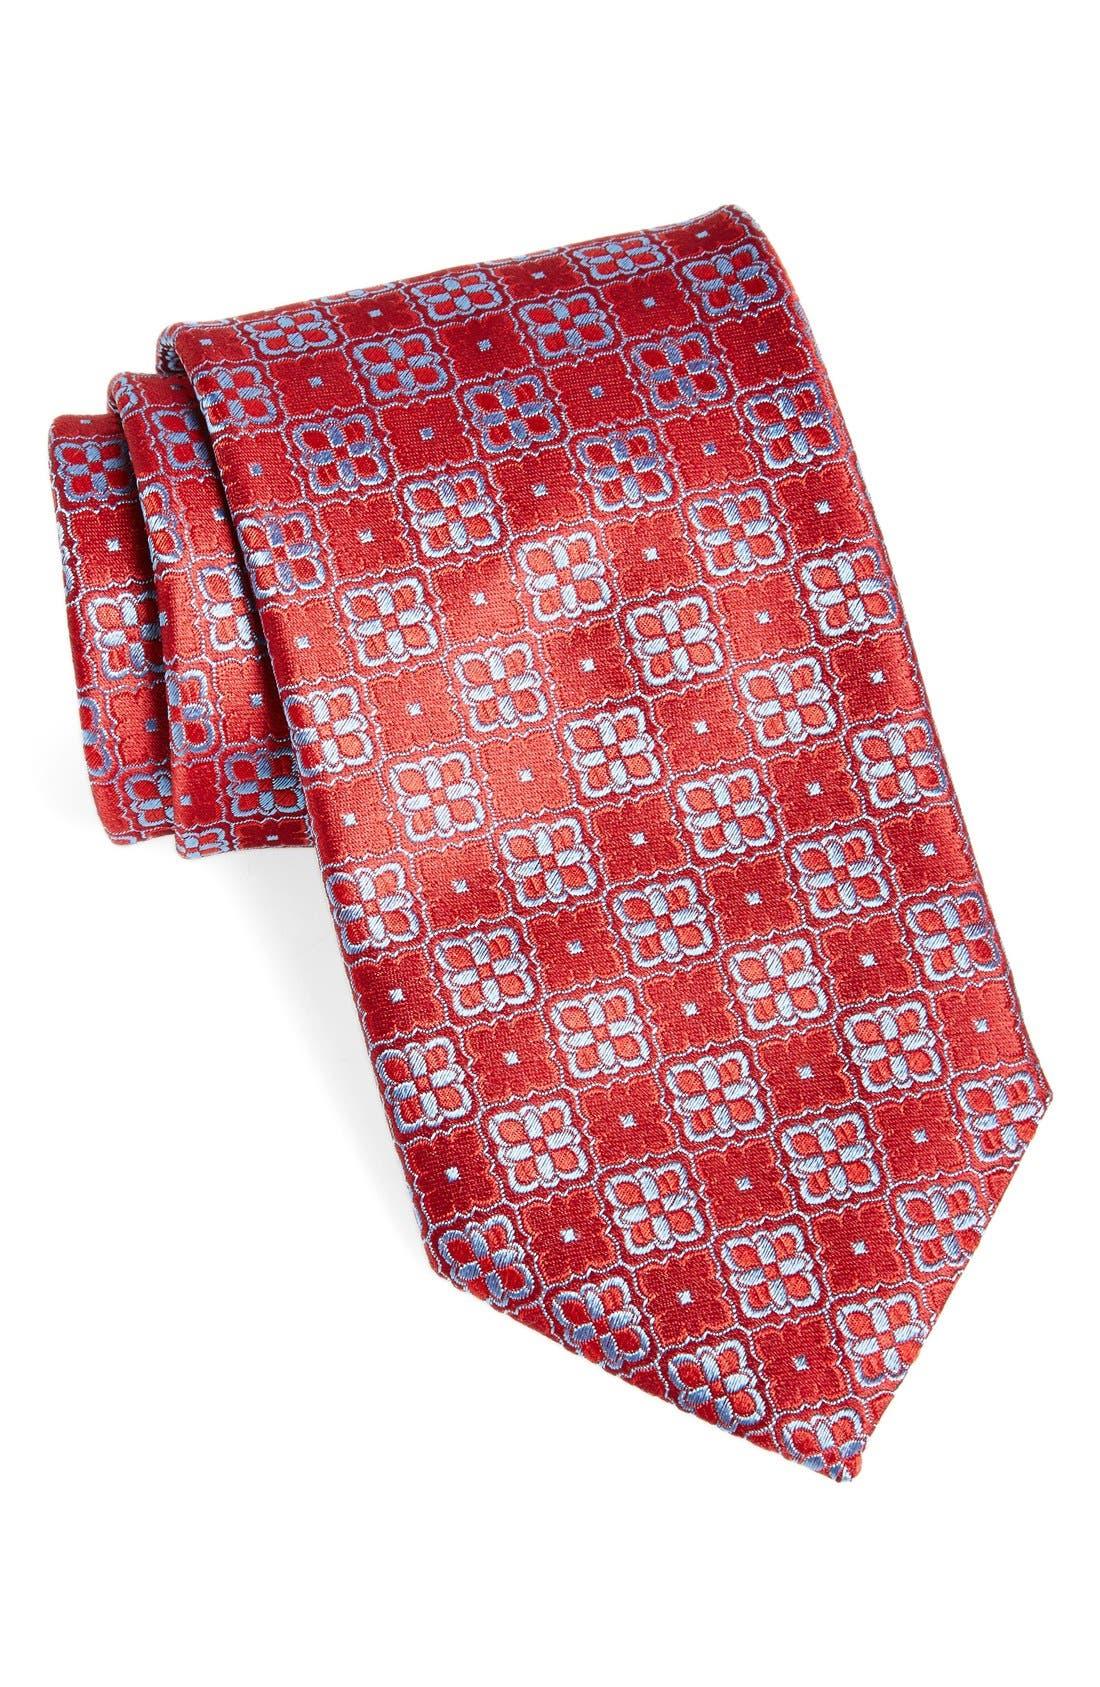 Alternate Image 1 Selected - Canali Geometric Woven Silk Tie